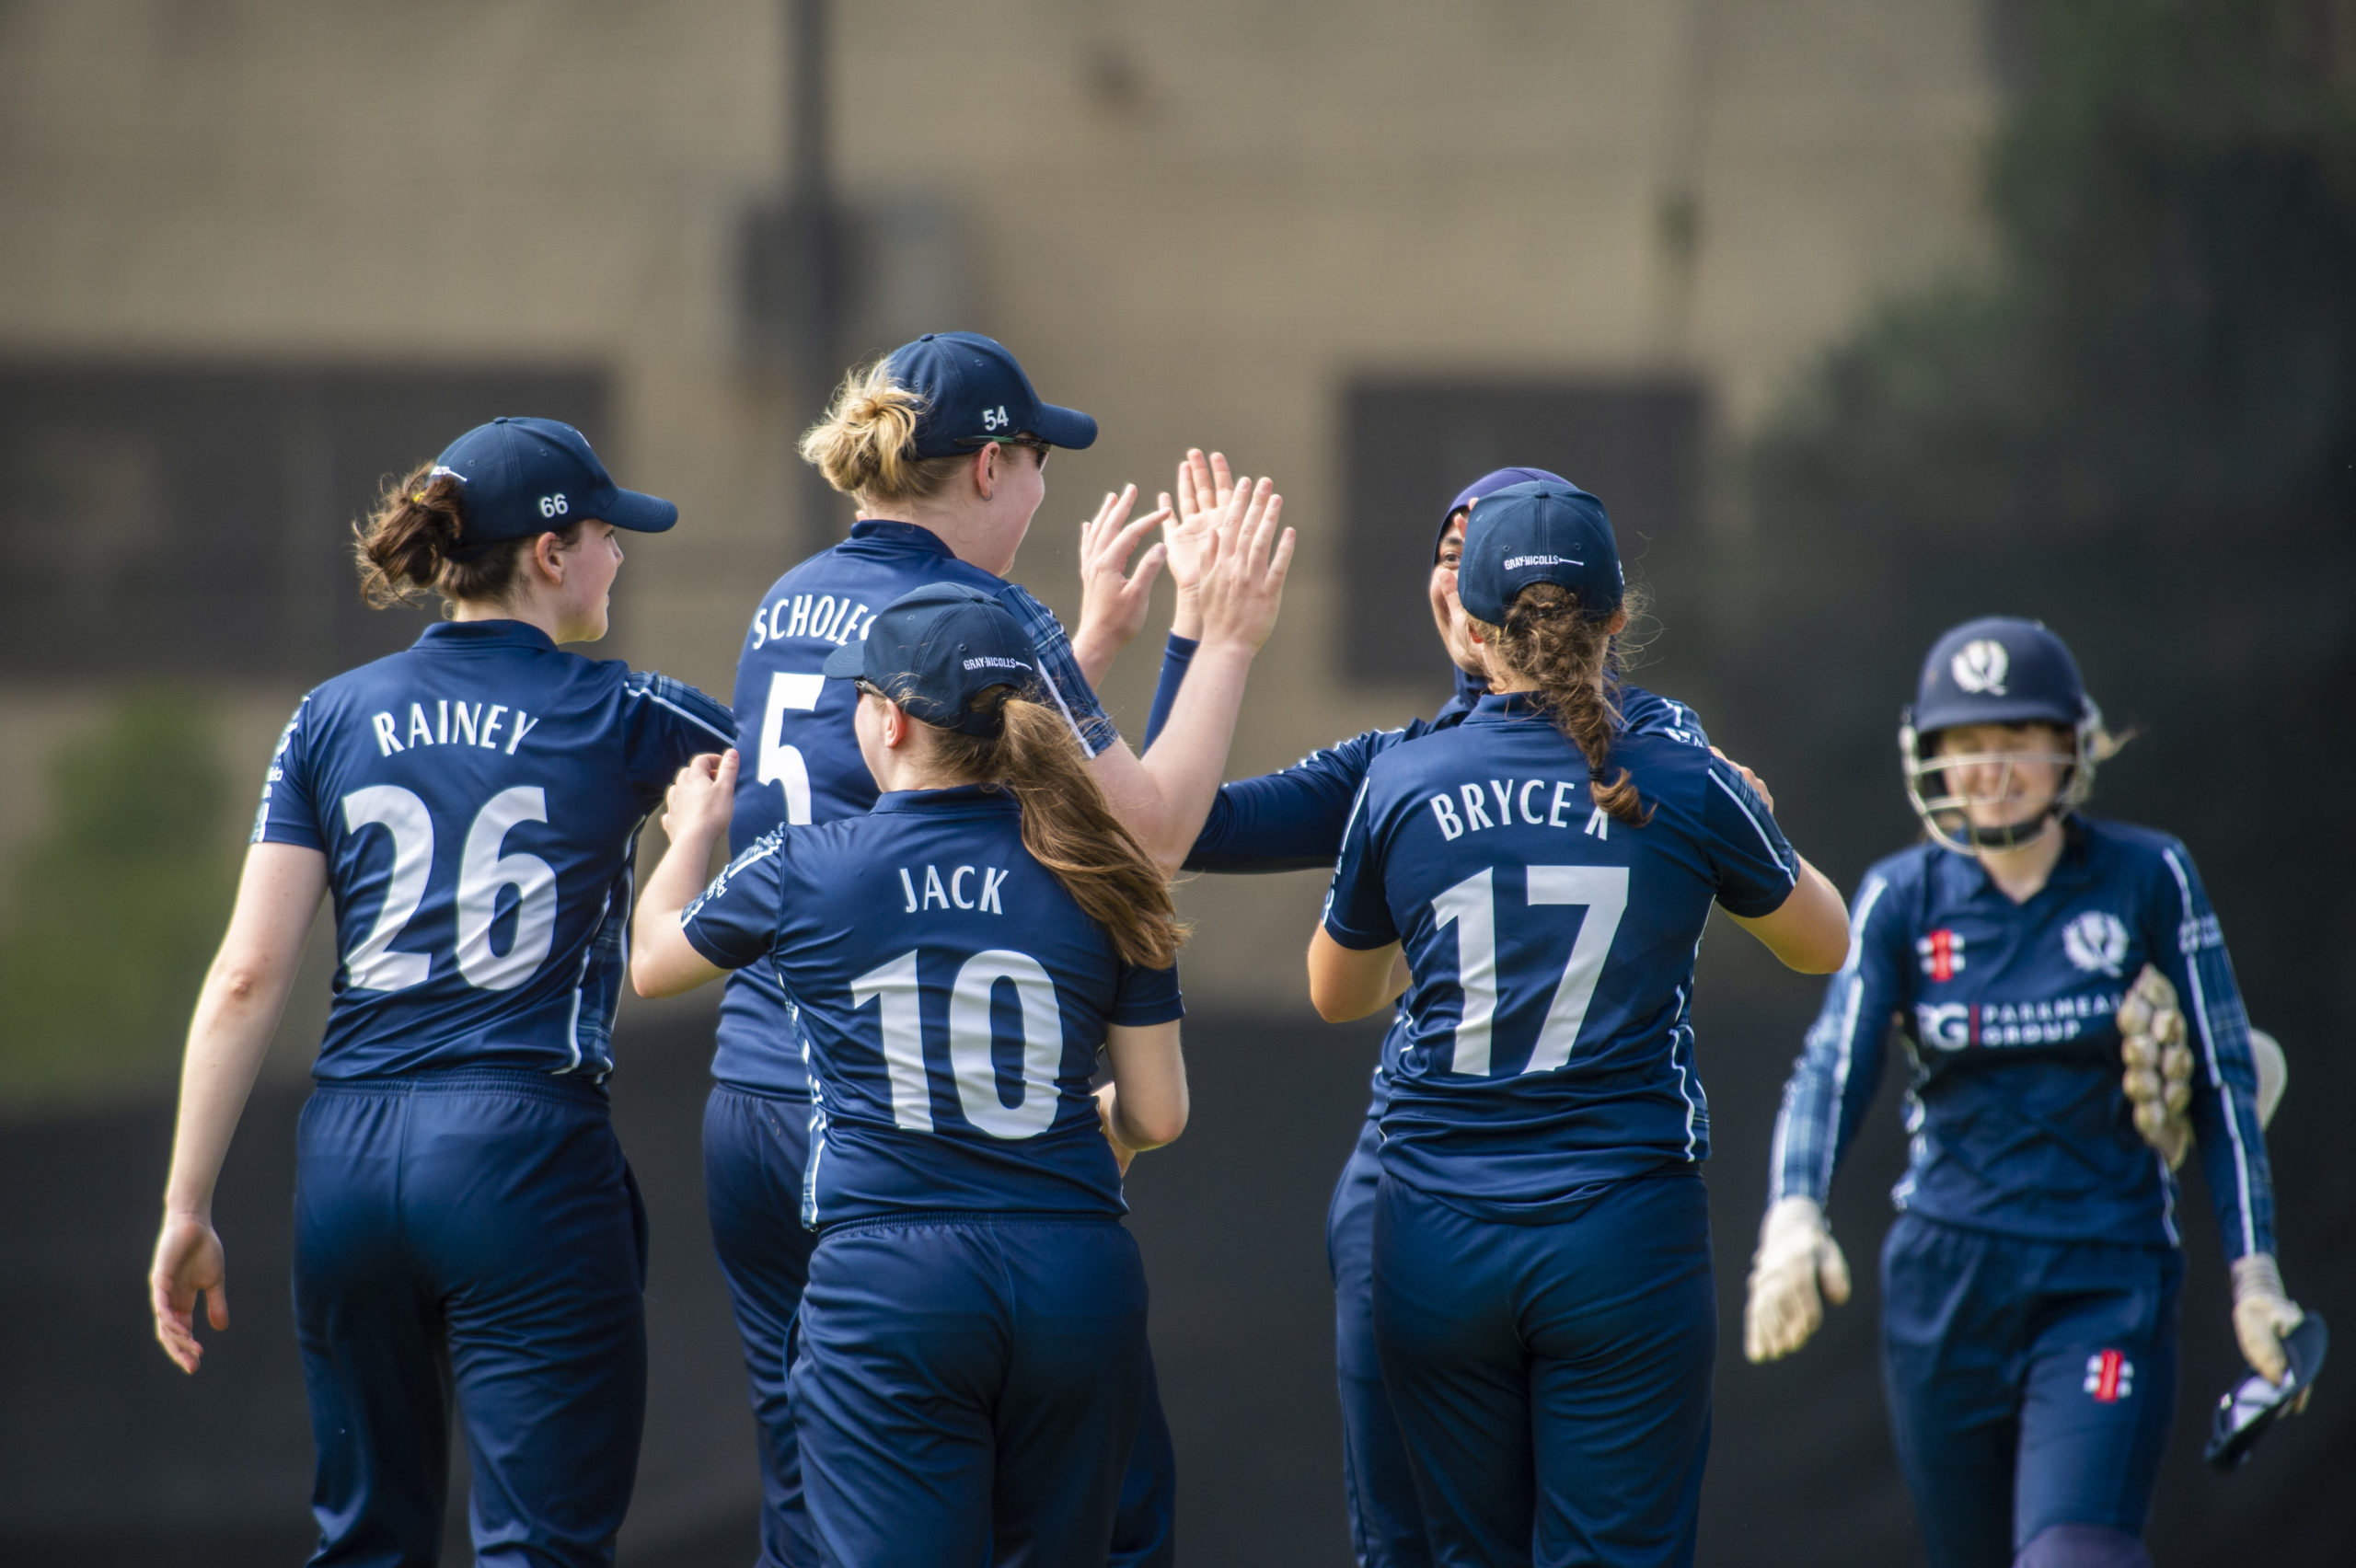 Cricket Scotland: Scotland Women name squad of 14 for Ireland series